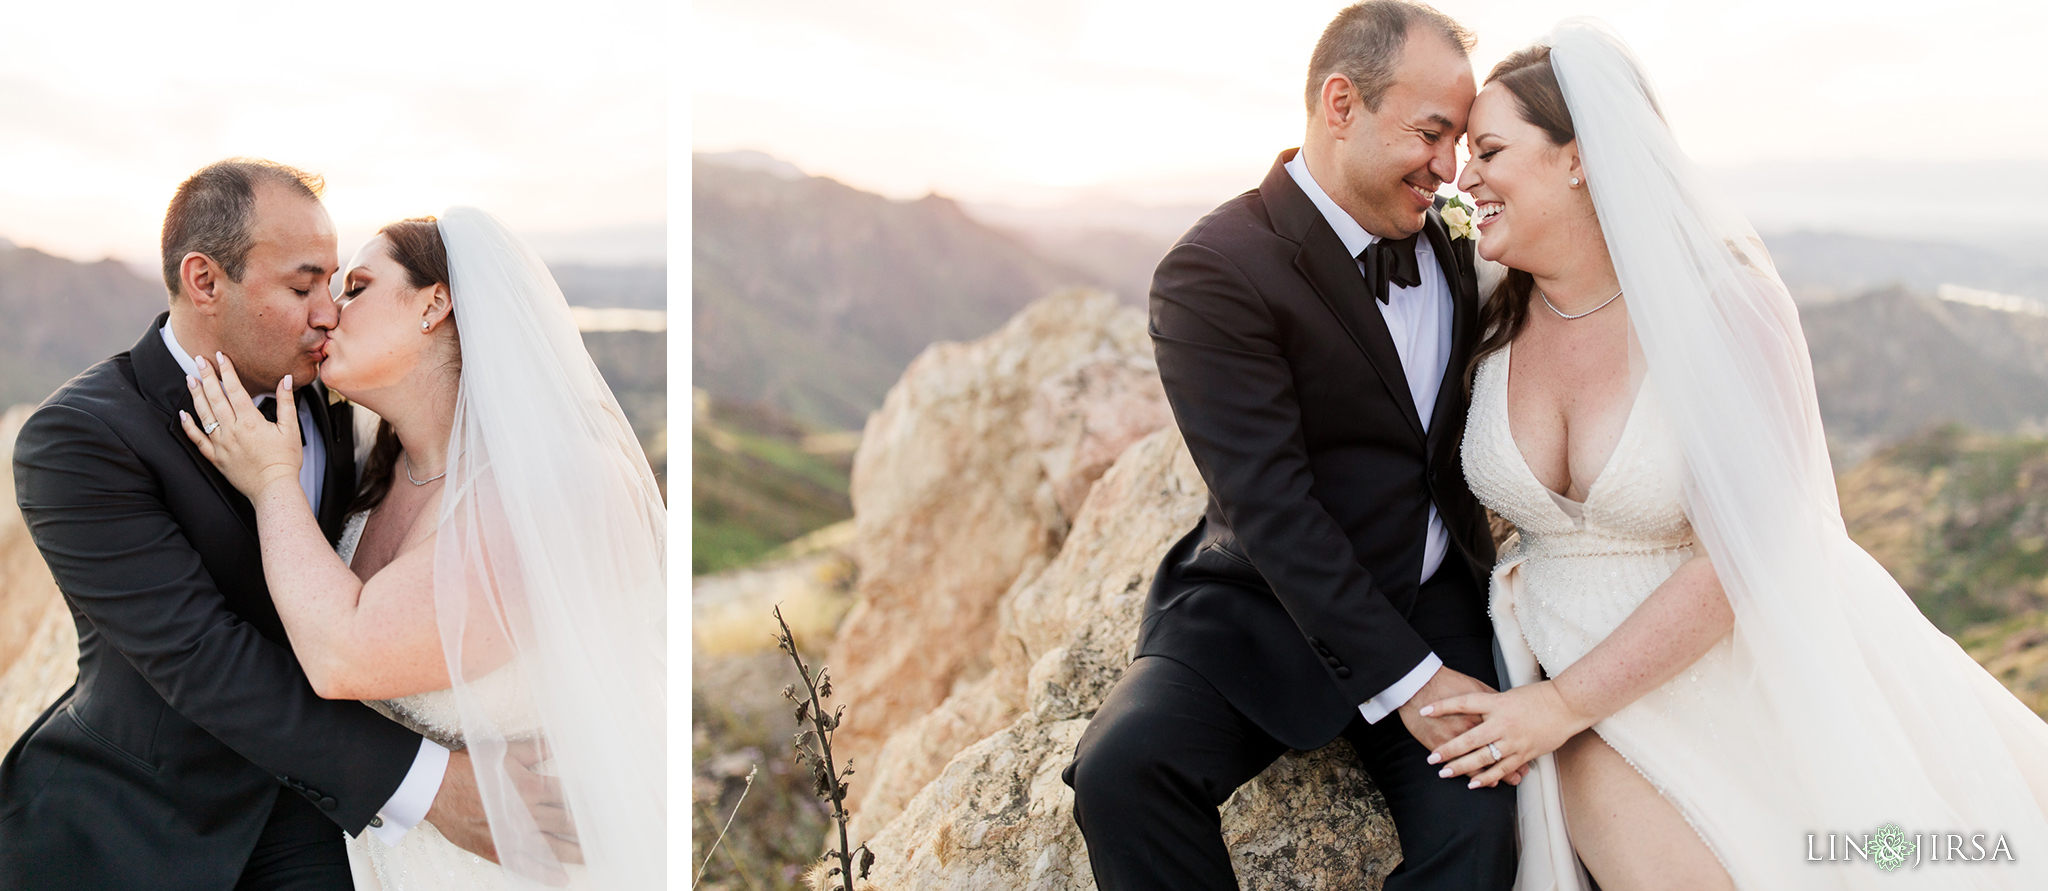 20 Malibu Rocky Oaks Los Angeles County Wedding Photographer